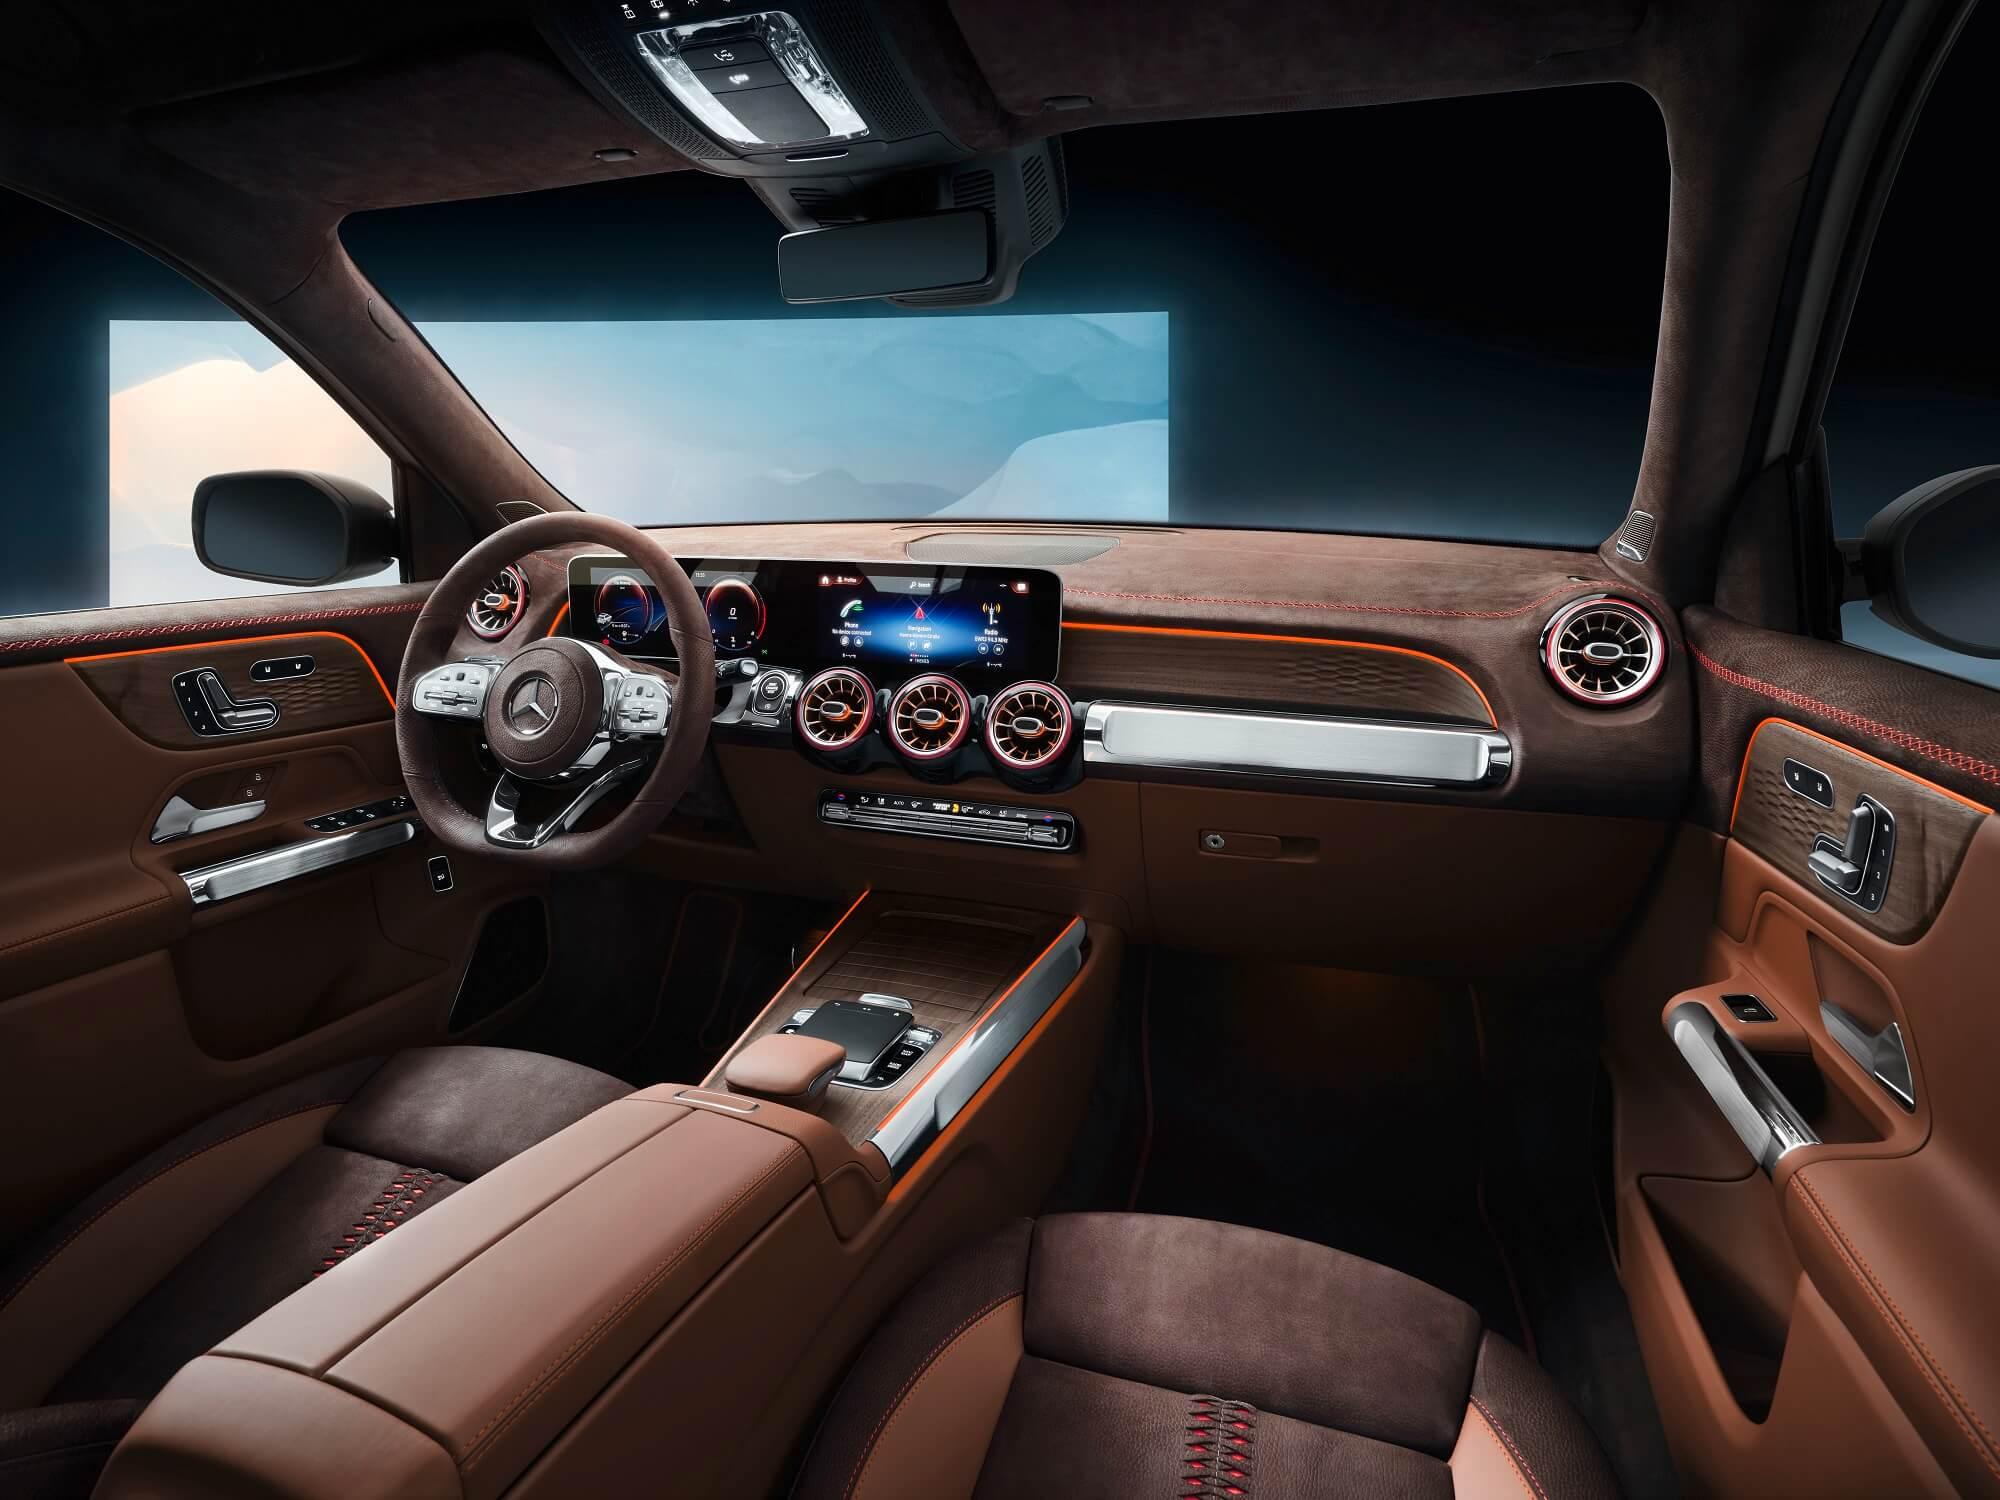 Mercedes-Benz Concept GLC